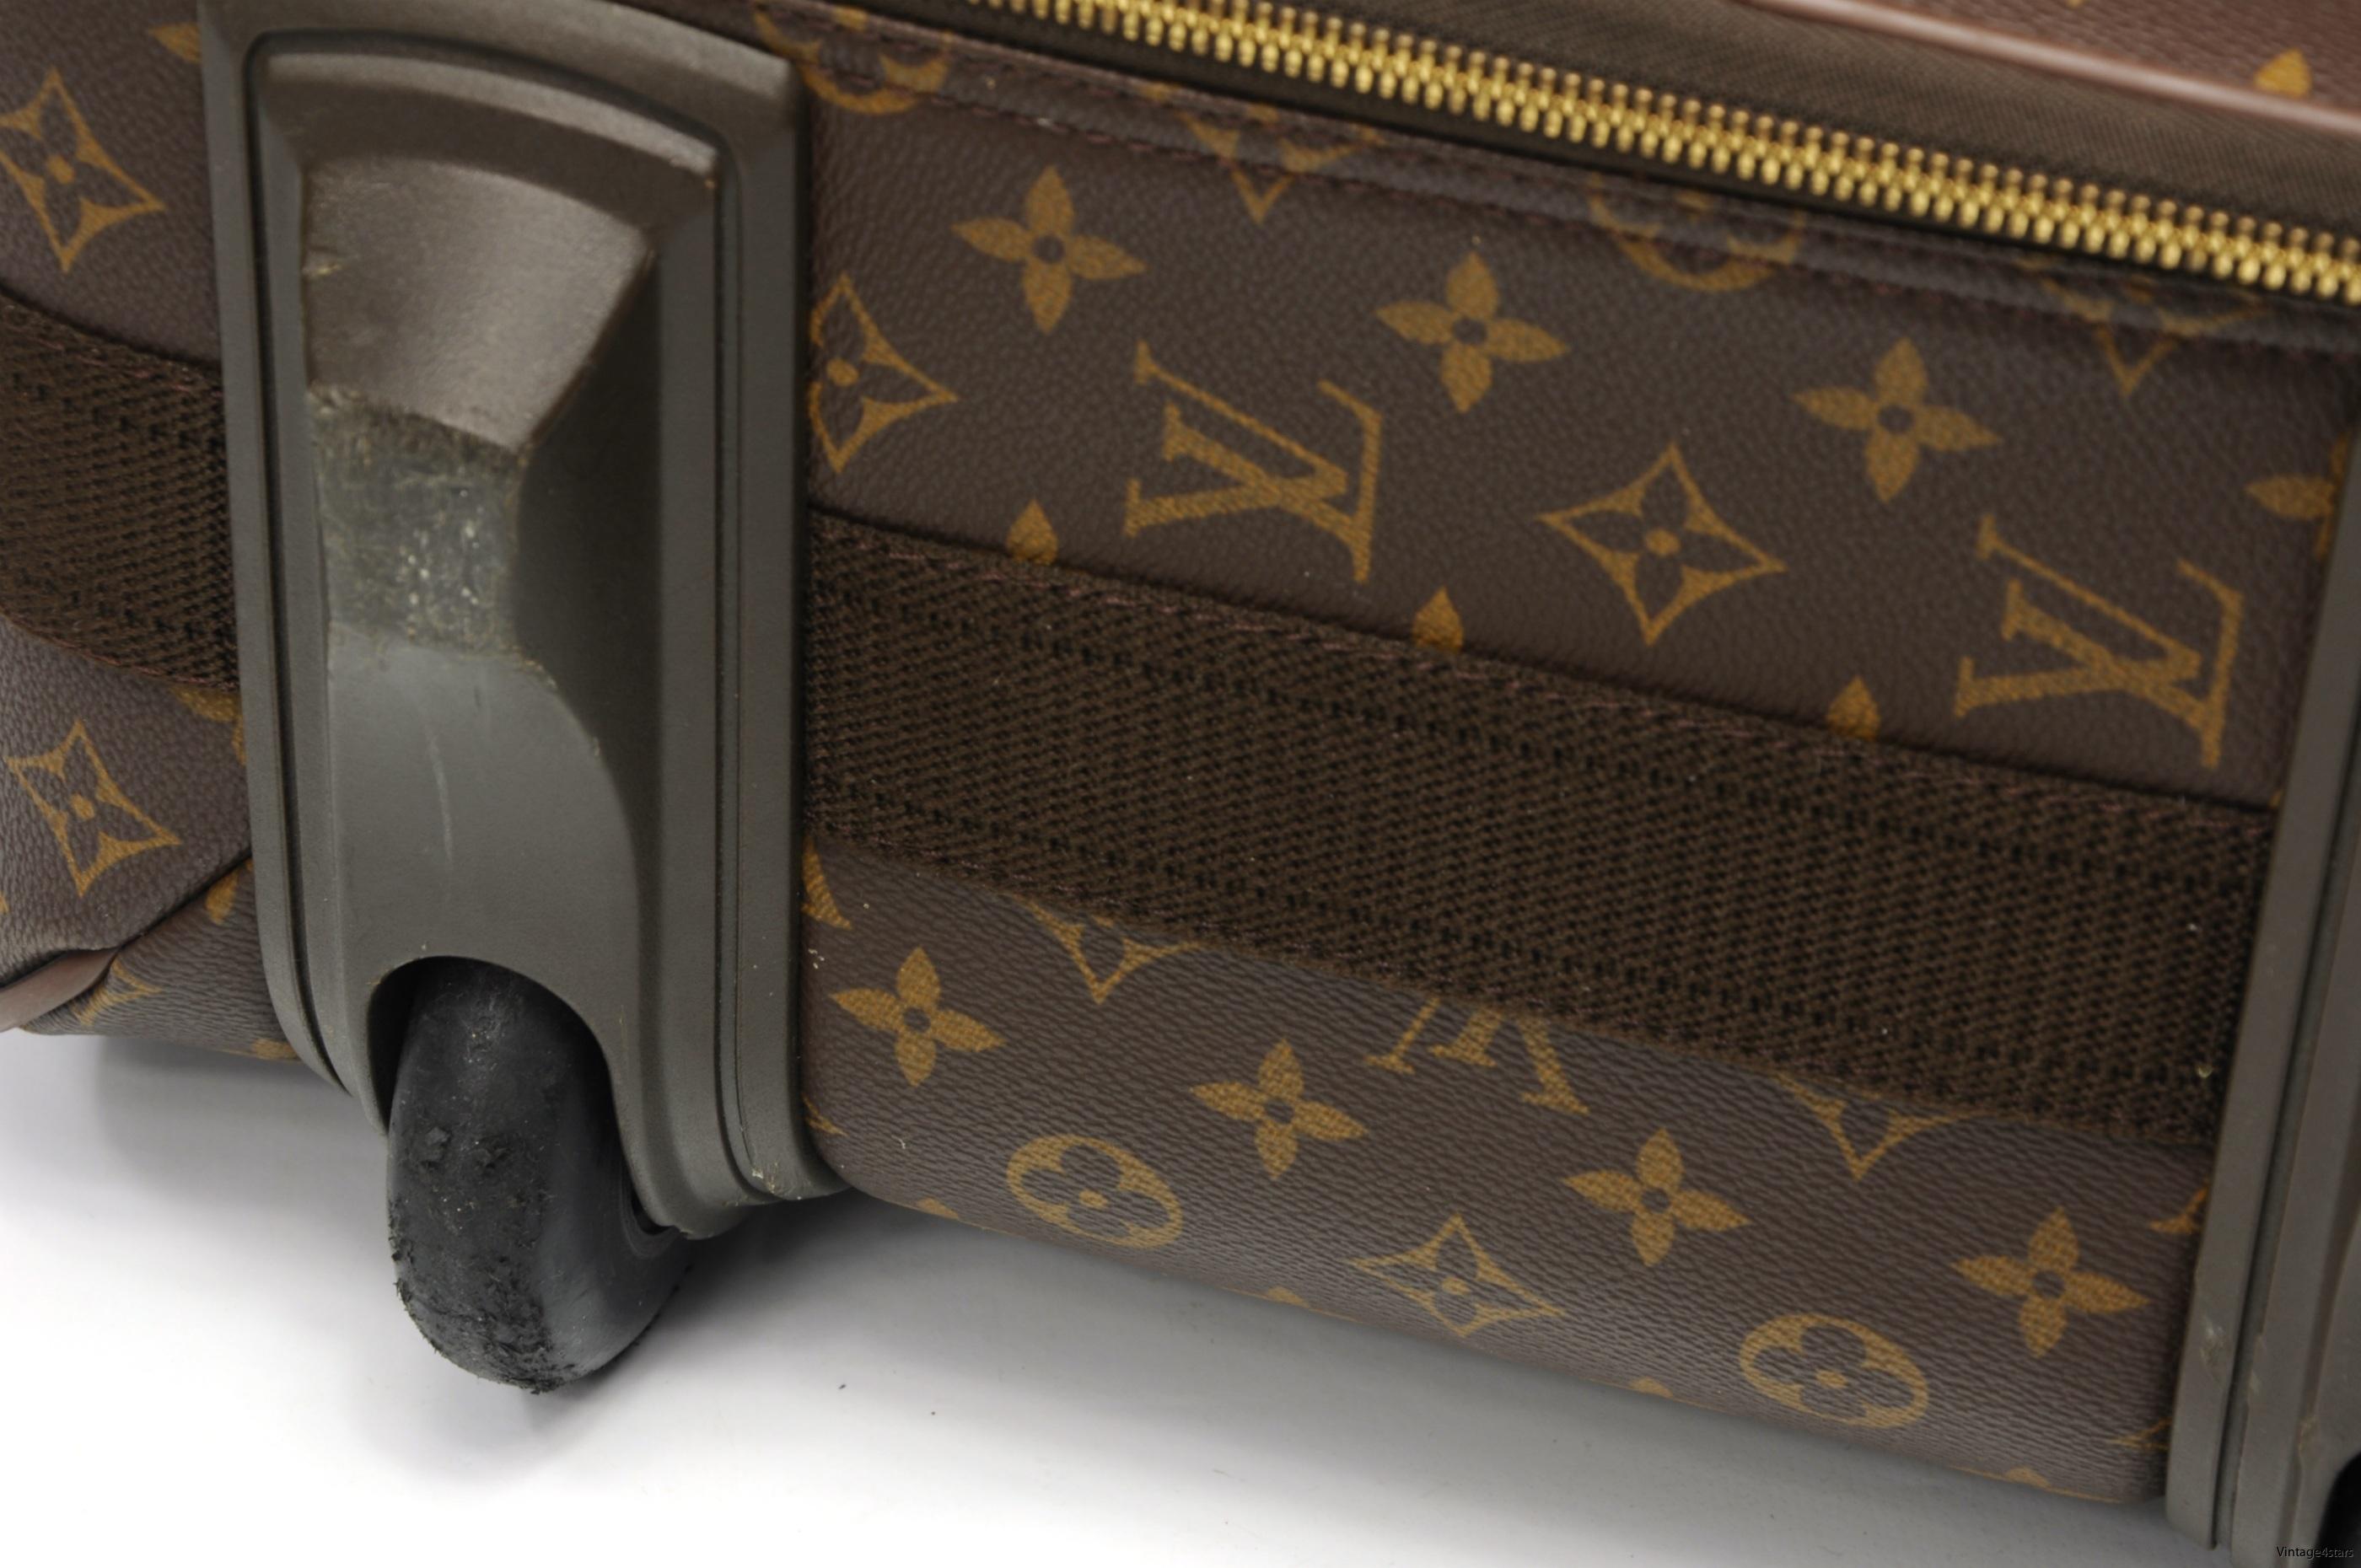 Louis Vuitton Pegase 55 Monogram 9